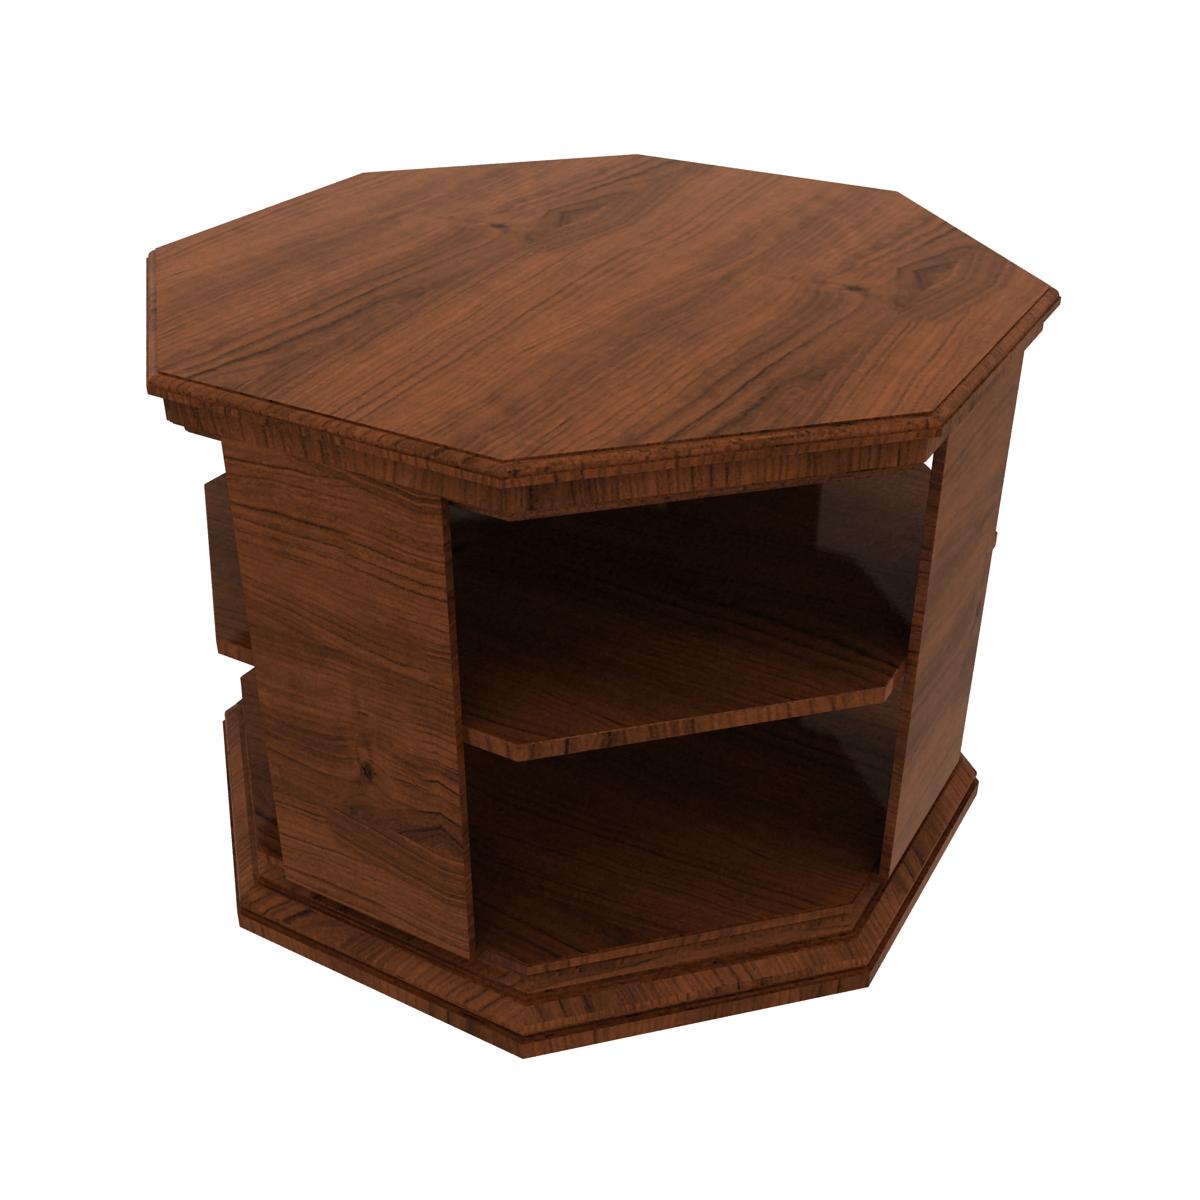 Corner tables furniture White Corner Table 3d Model Download 3ds Max Fbx Obj In Home Office Furniture Marsballoon Corner Table 3d Model